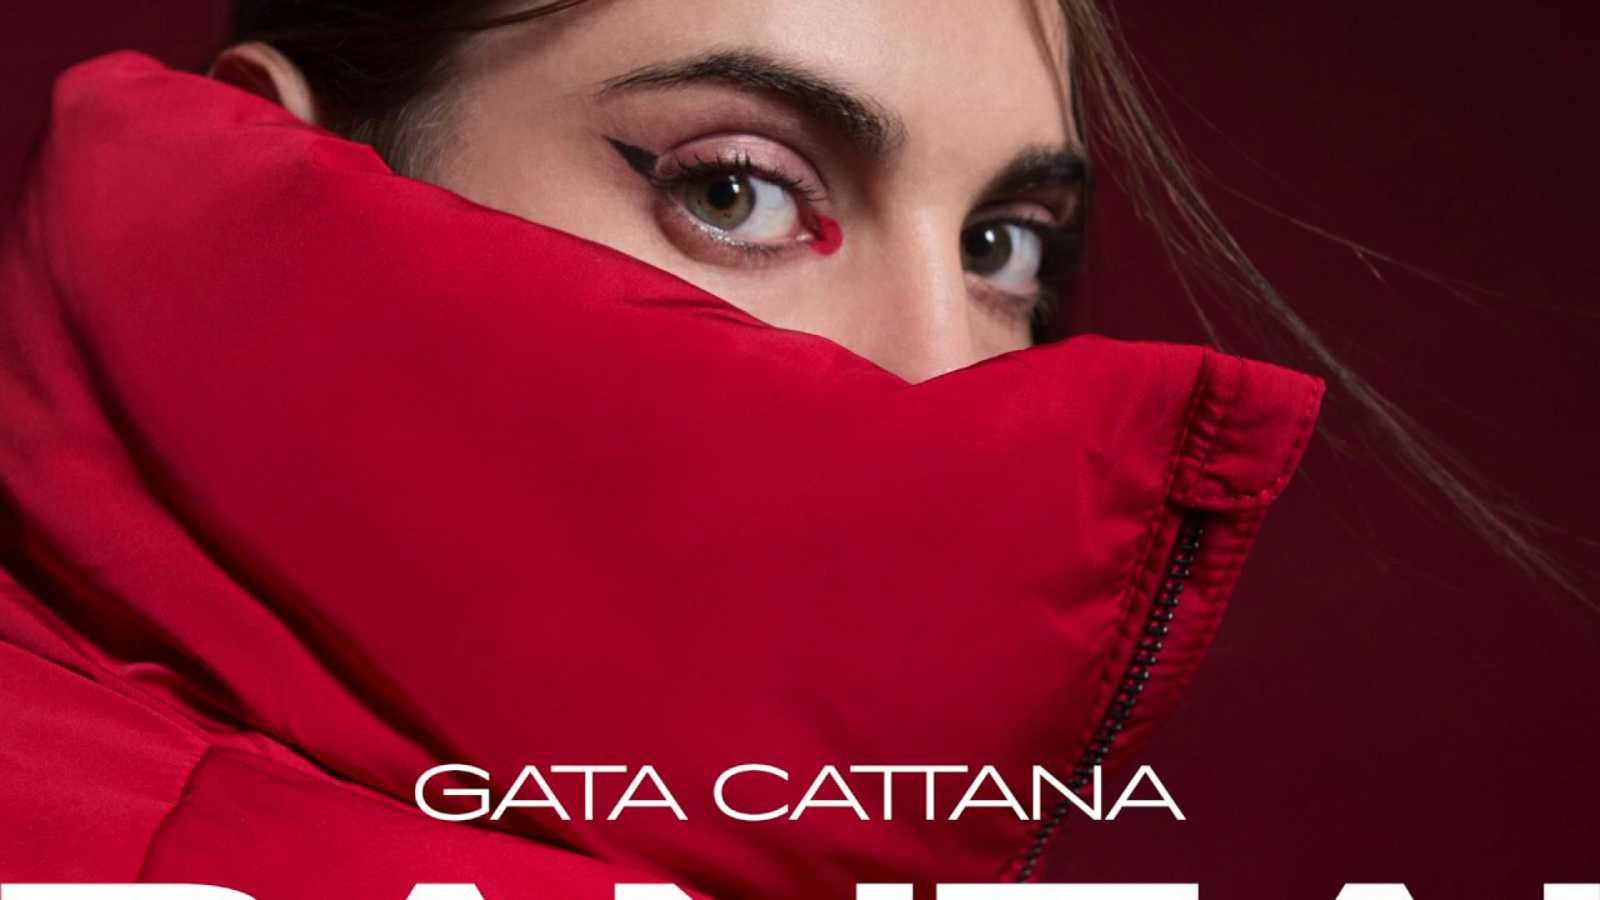 Tendencias - Gata Cattana - 03/03/20 - Escuchar ahora